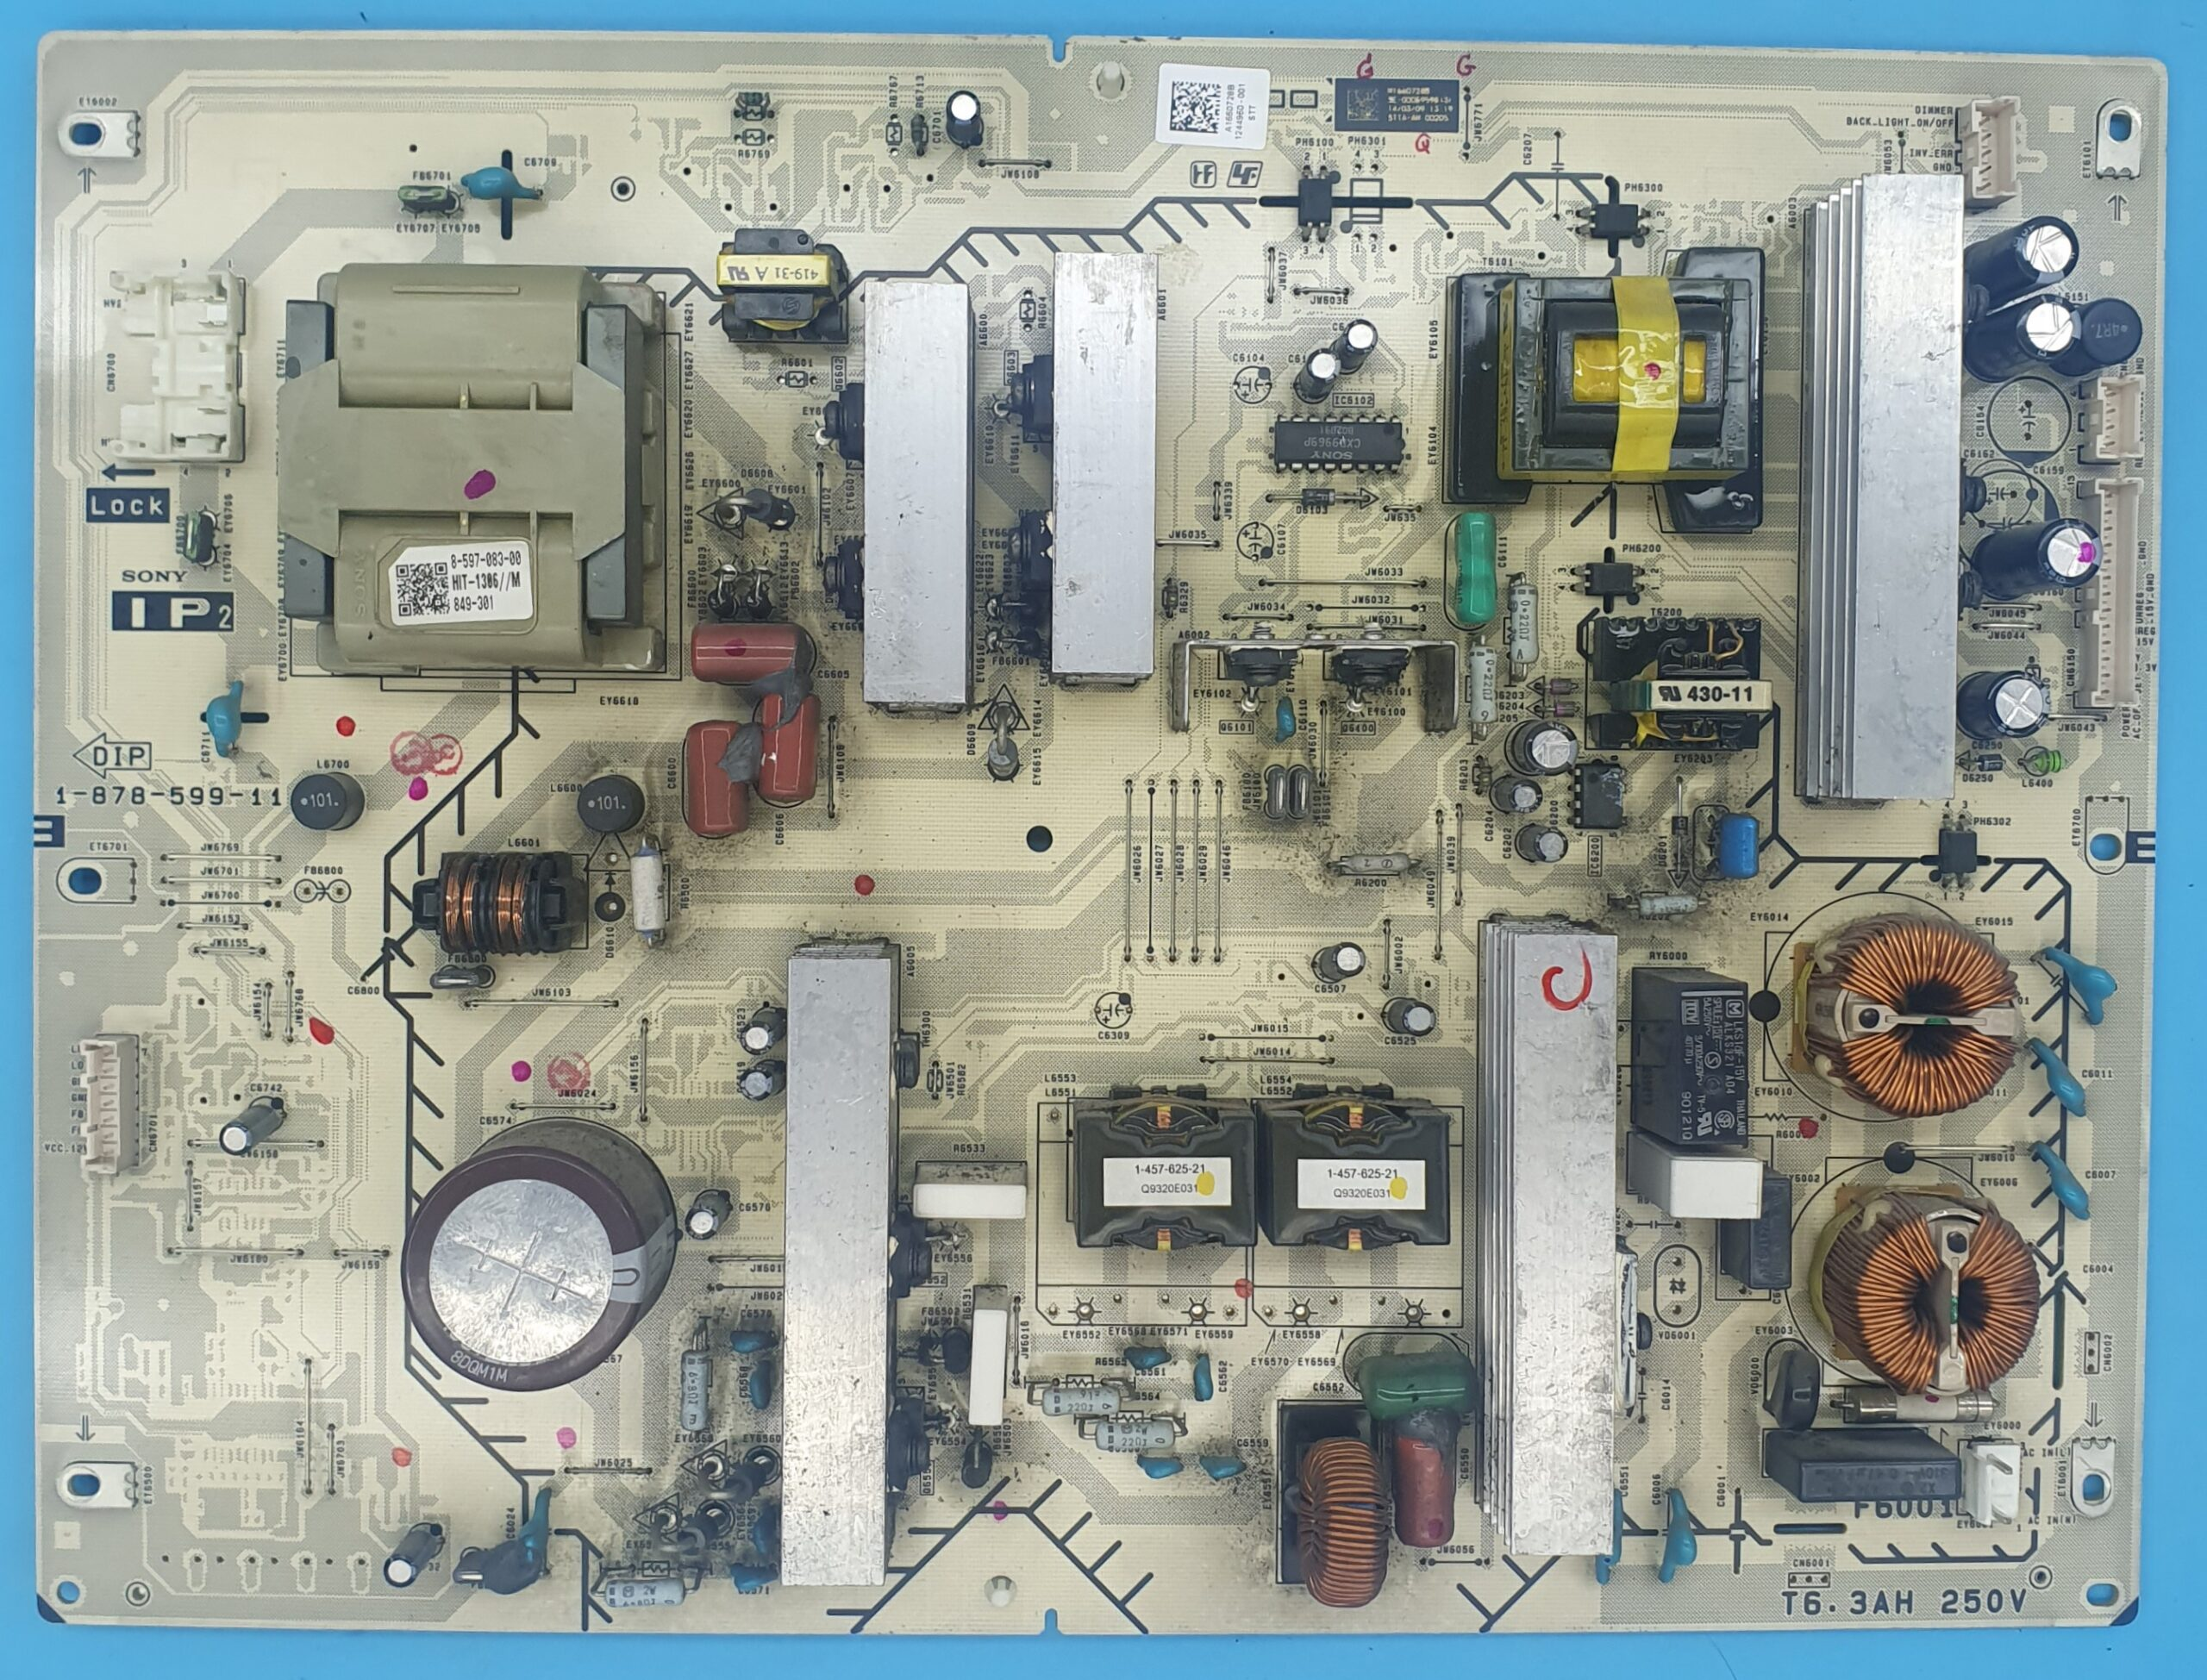 1-878-599-11 Sony Power (KDV DAHİL = 150 TL)